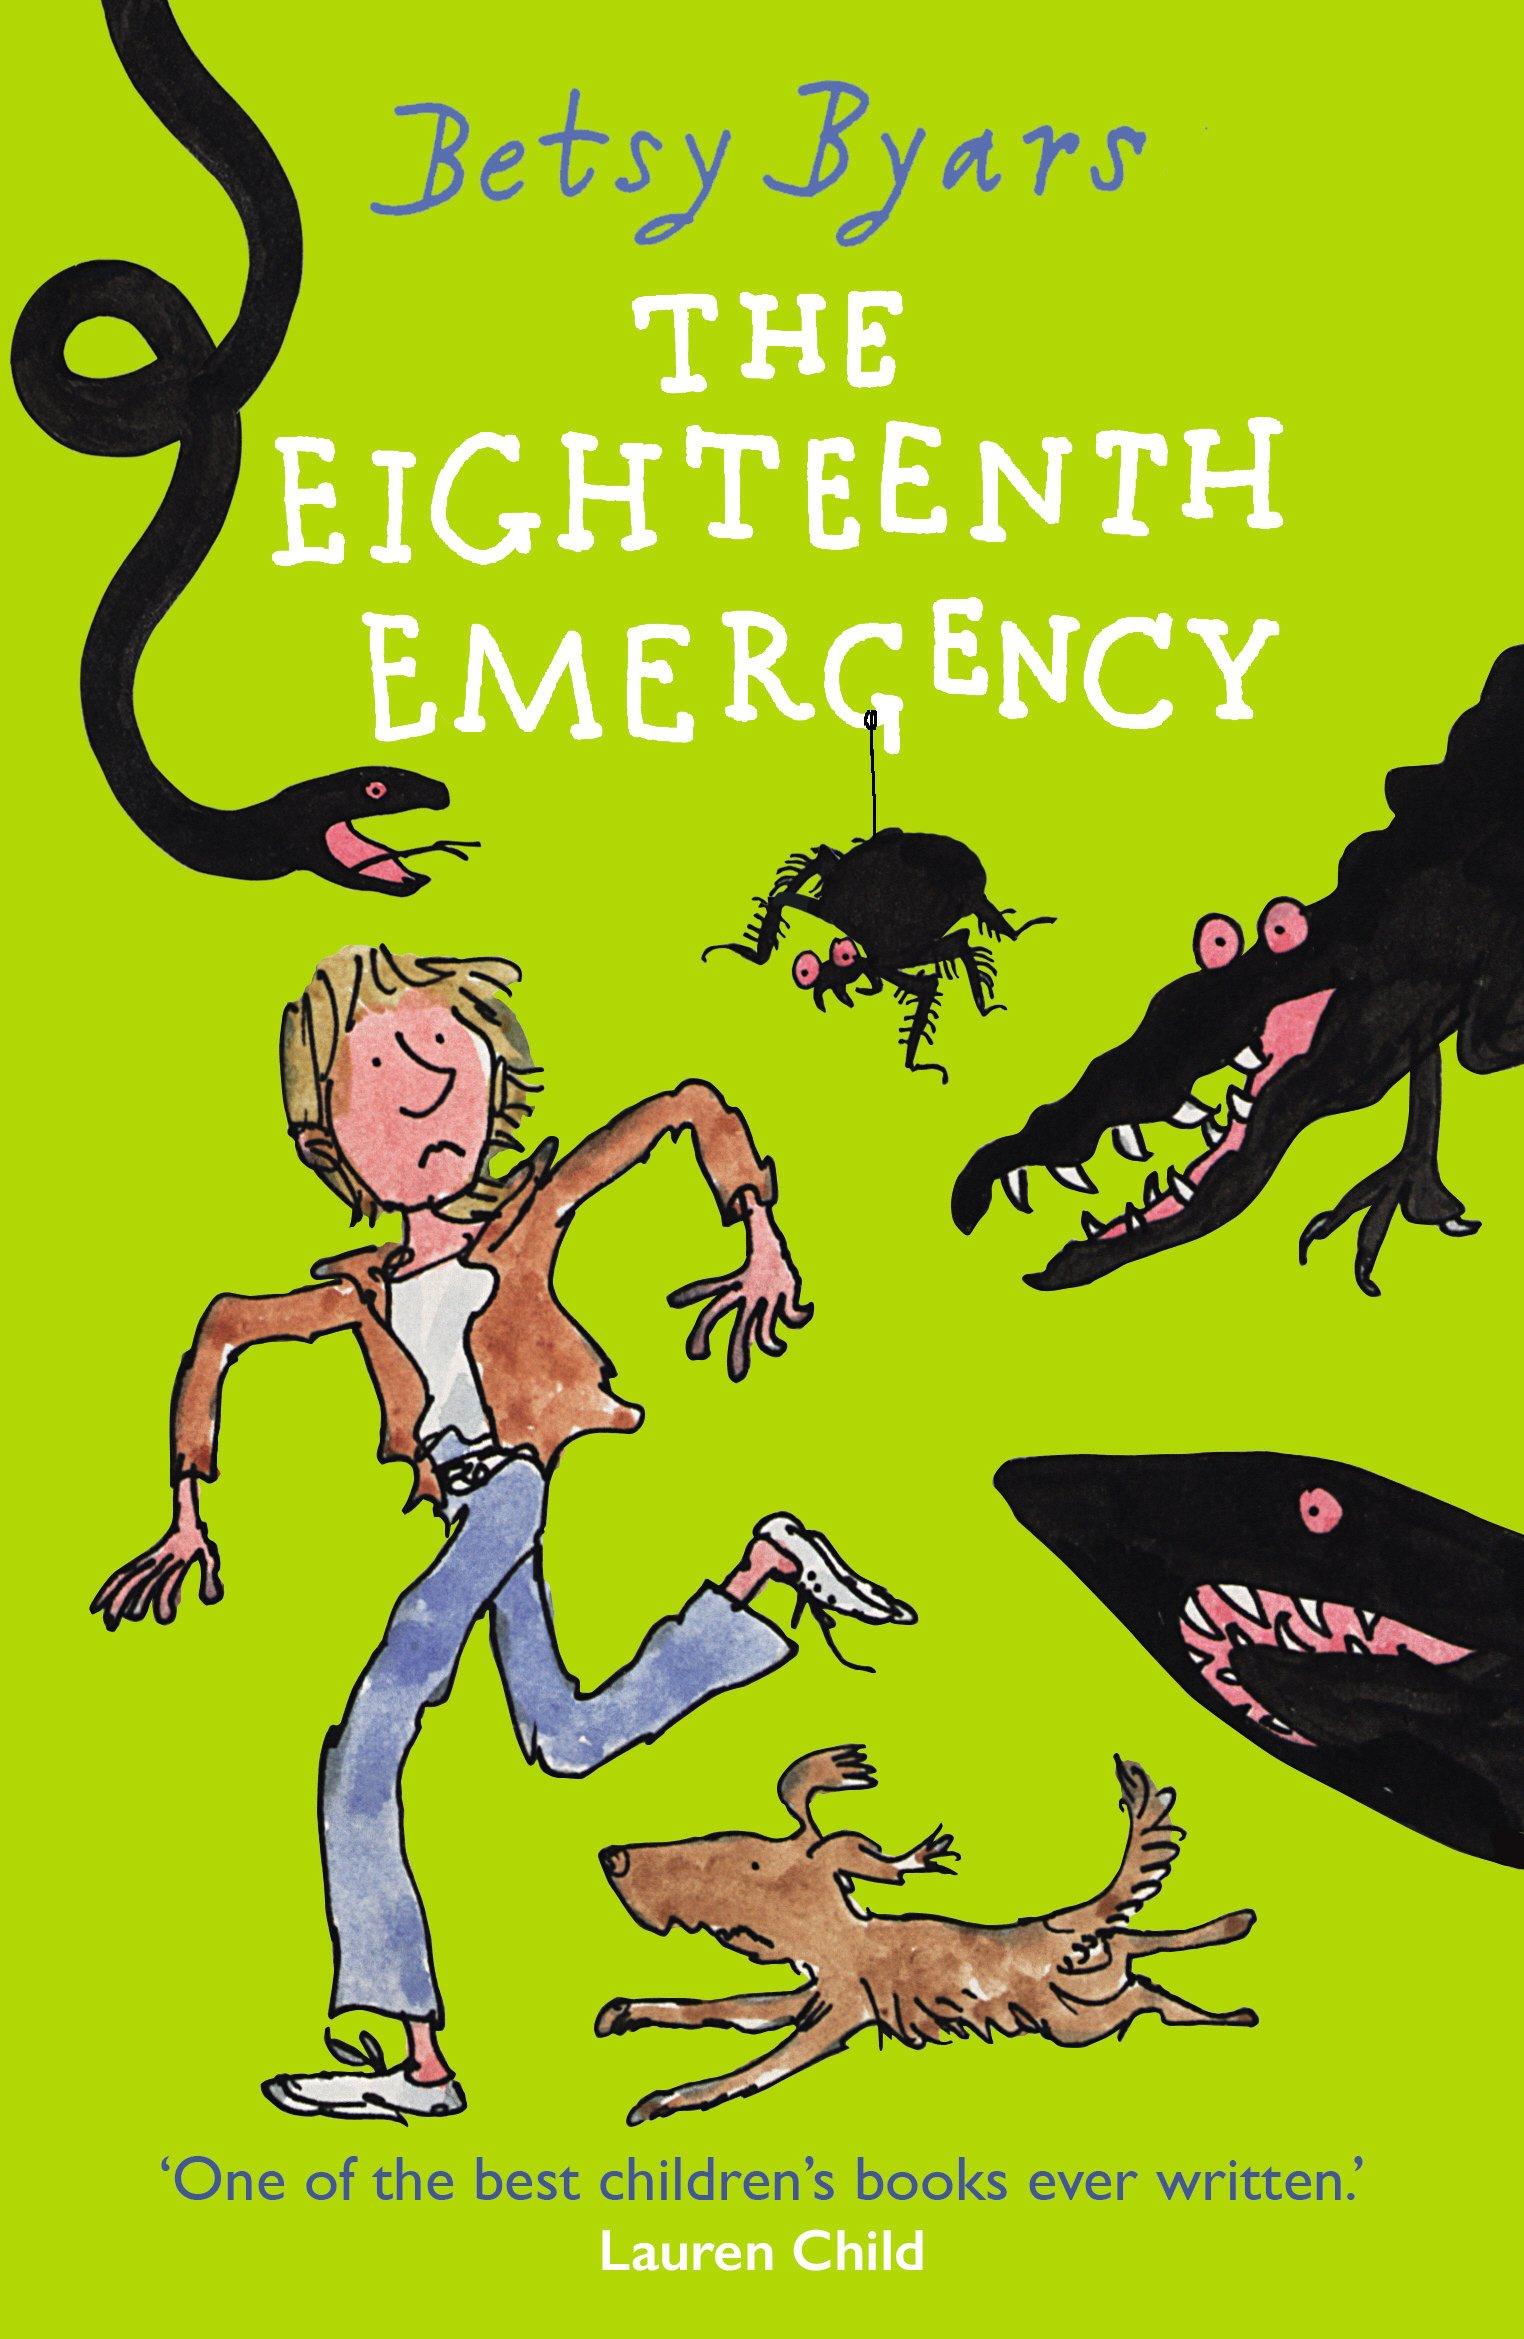 The Eighteenth Emergency: Amazon.co.uk: Byars, Betsy: 9781782955344: Books